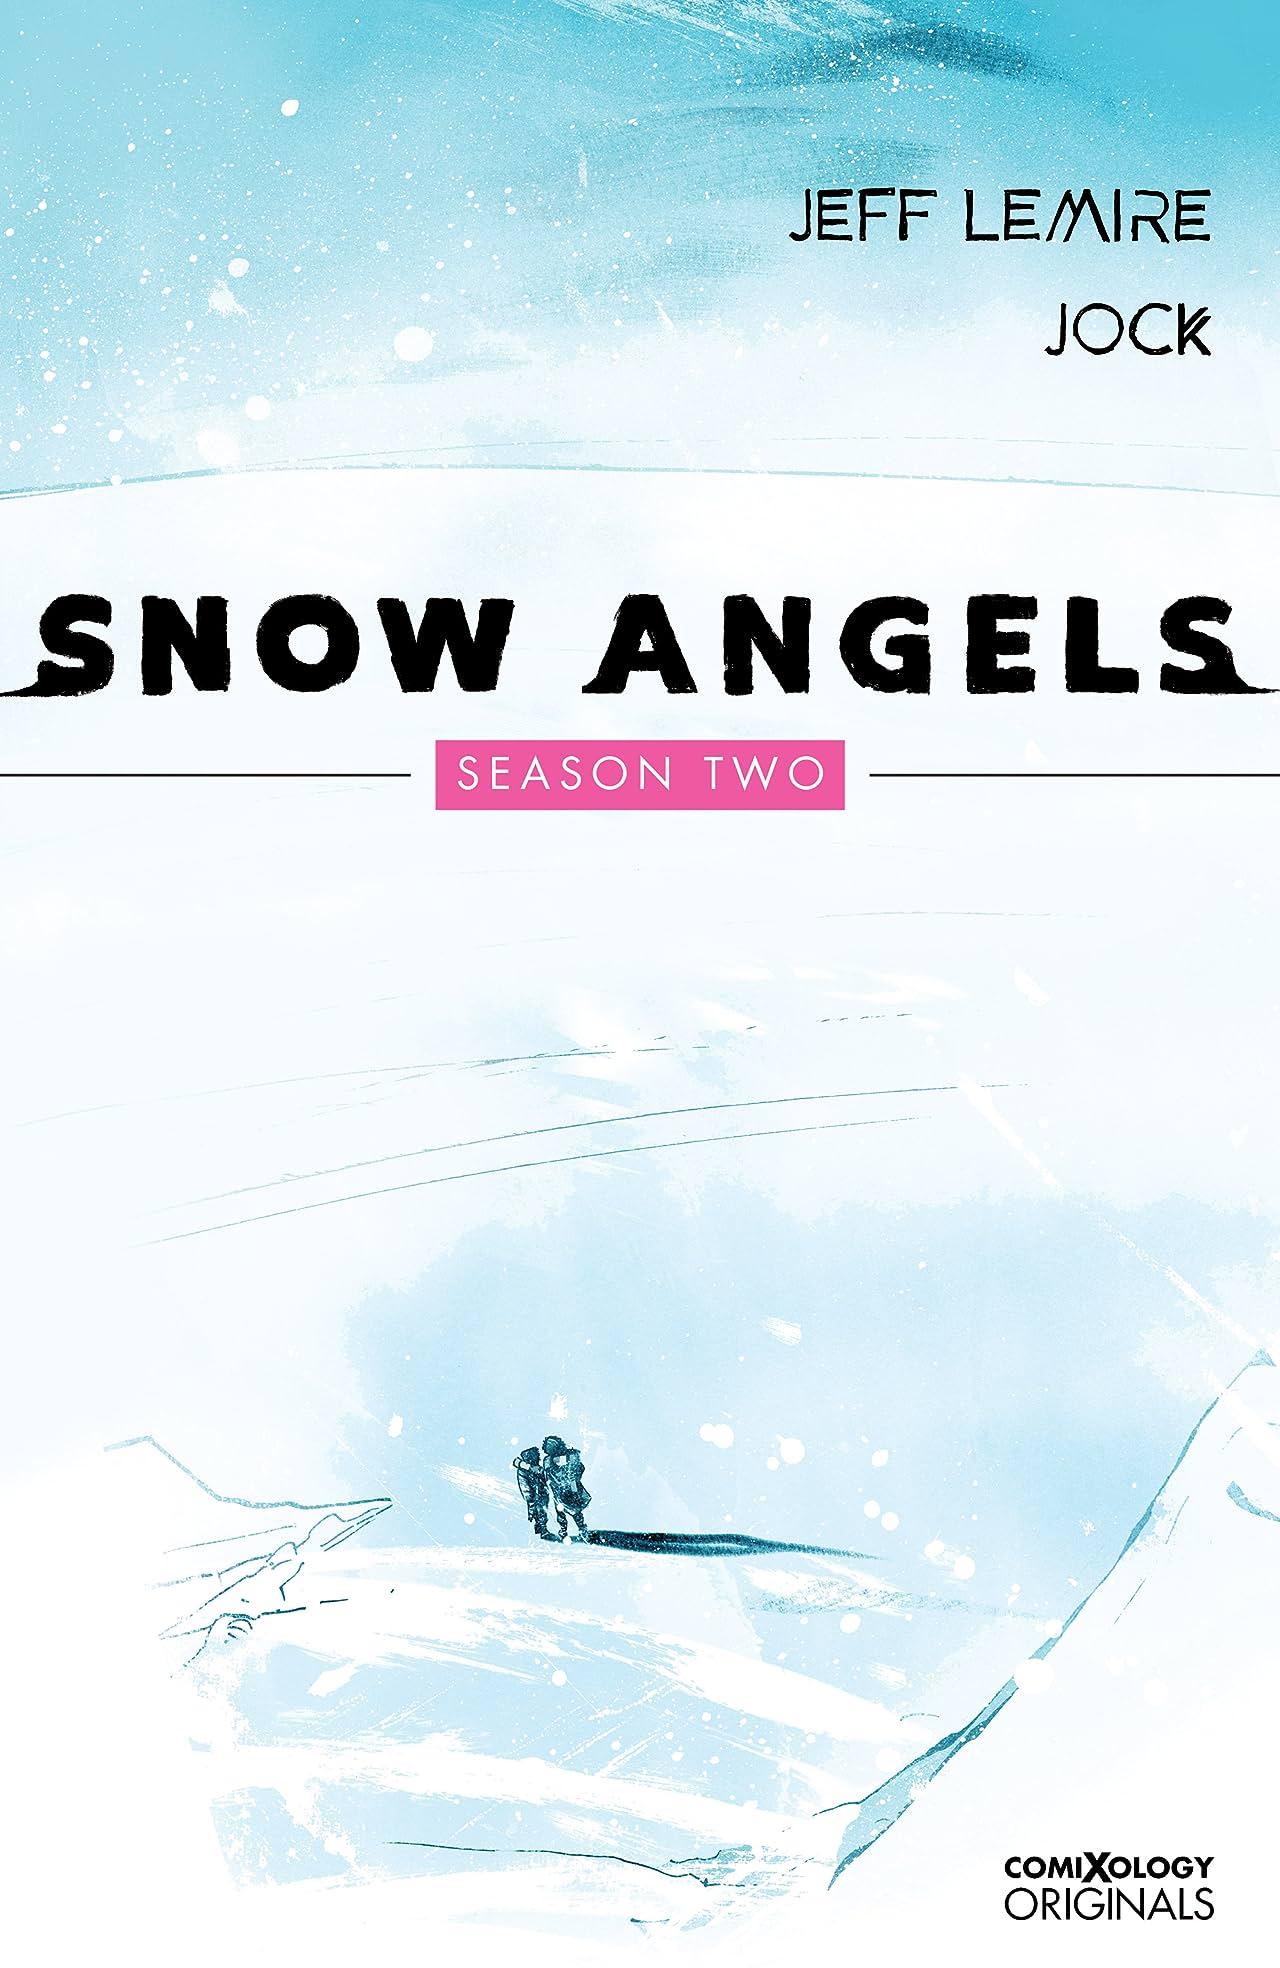 Snow Angels Season Two (comiXology Originals)